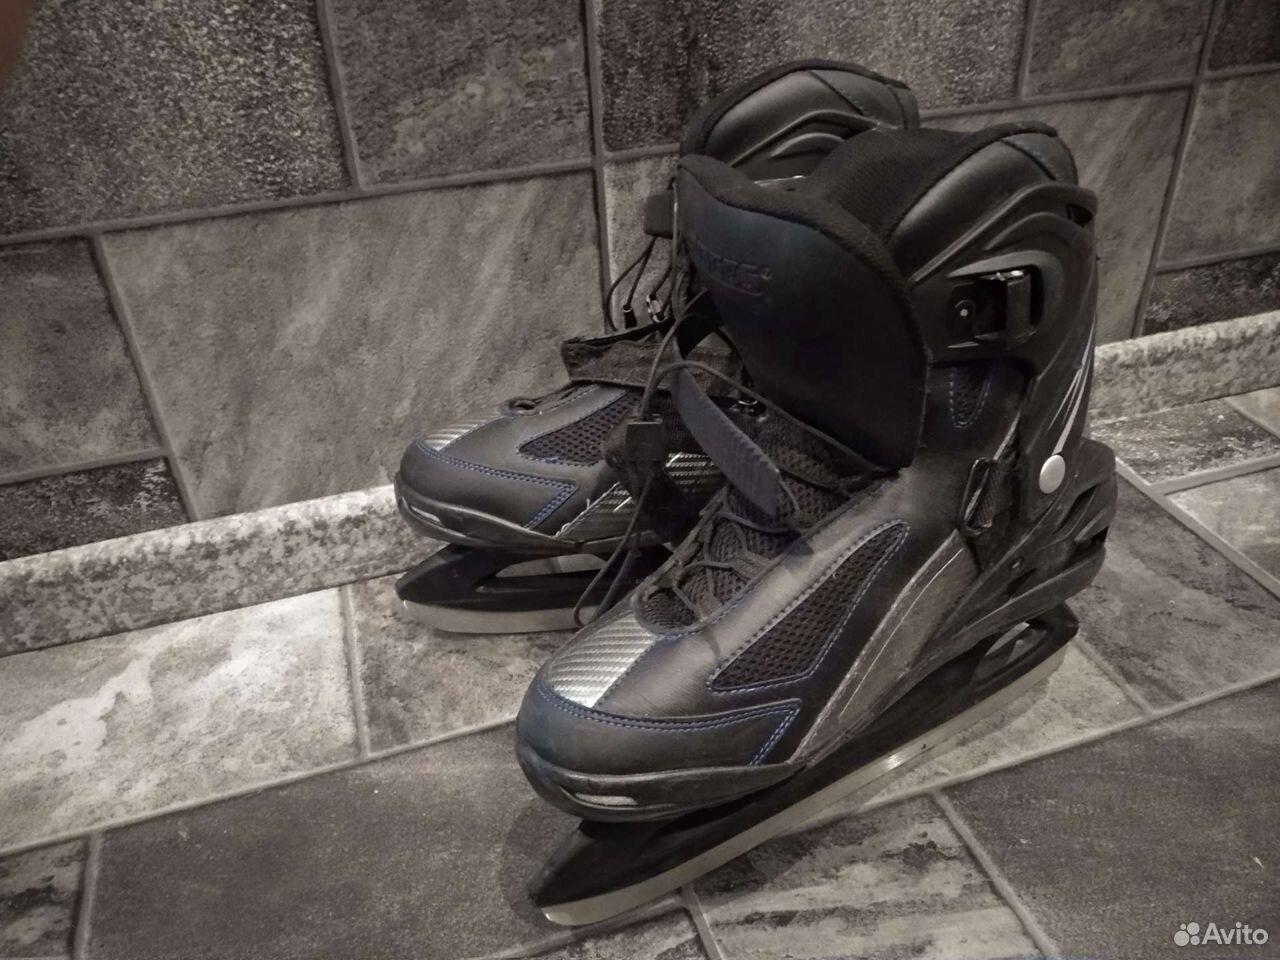 Skates roces